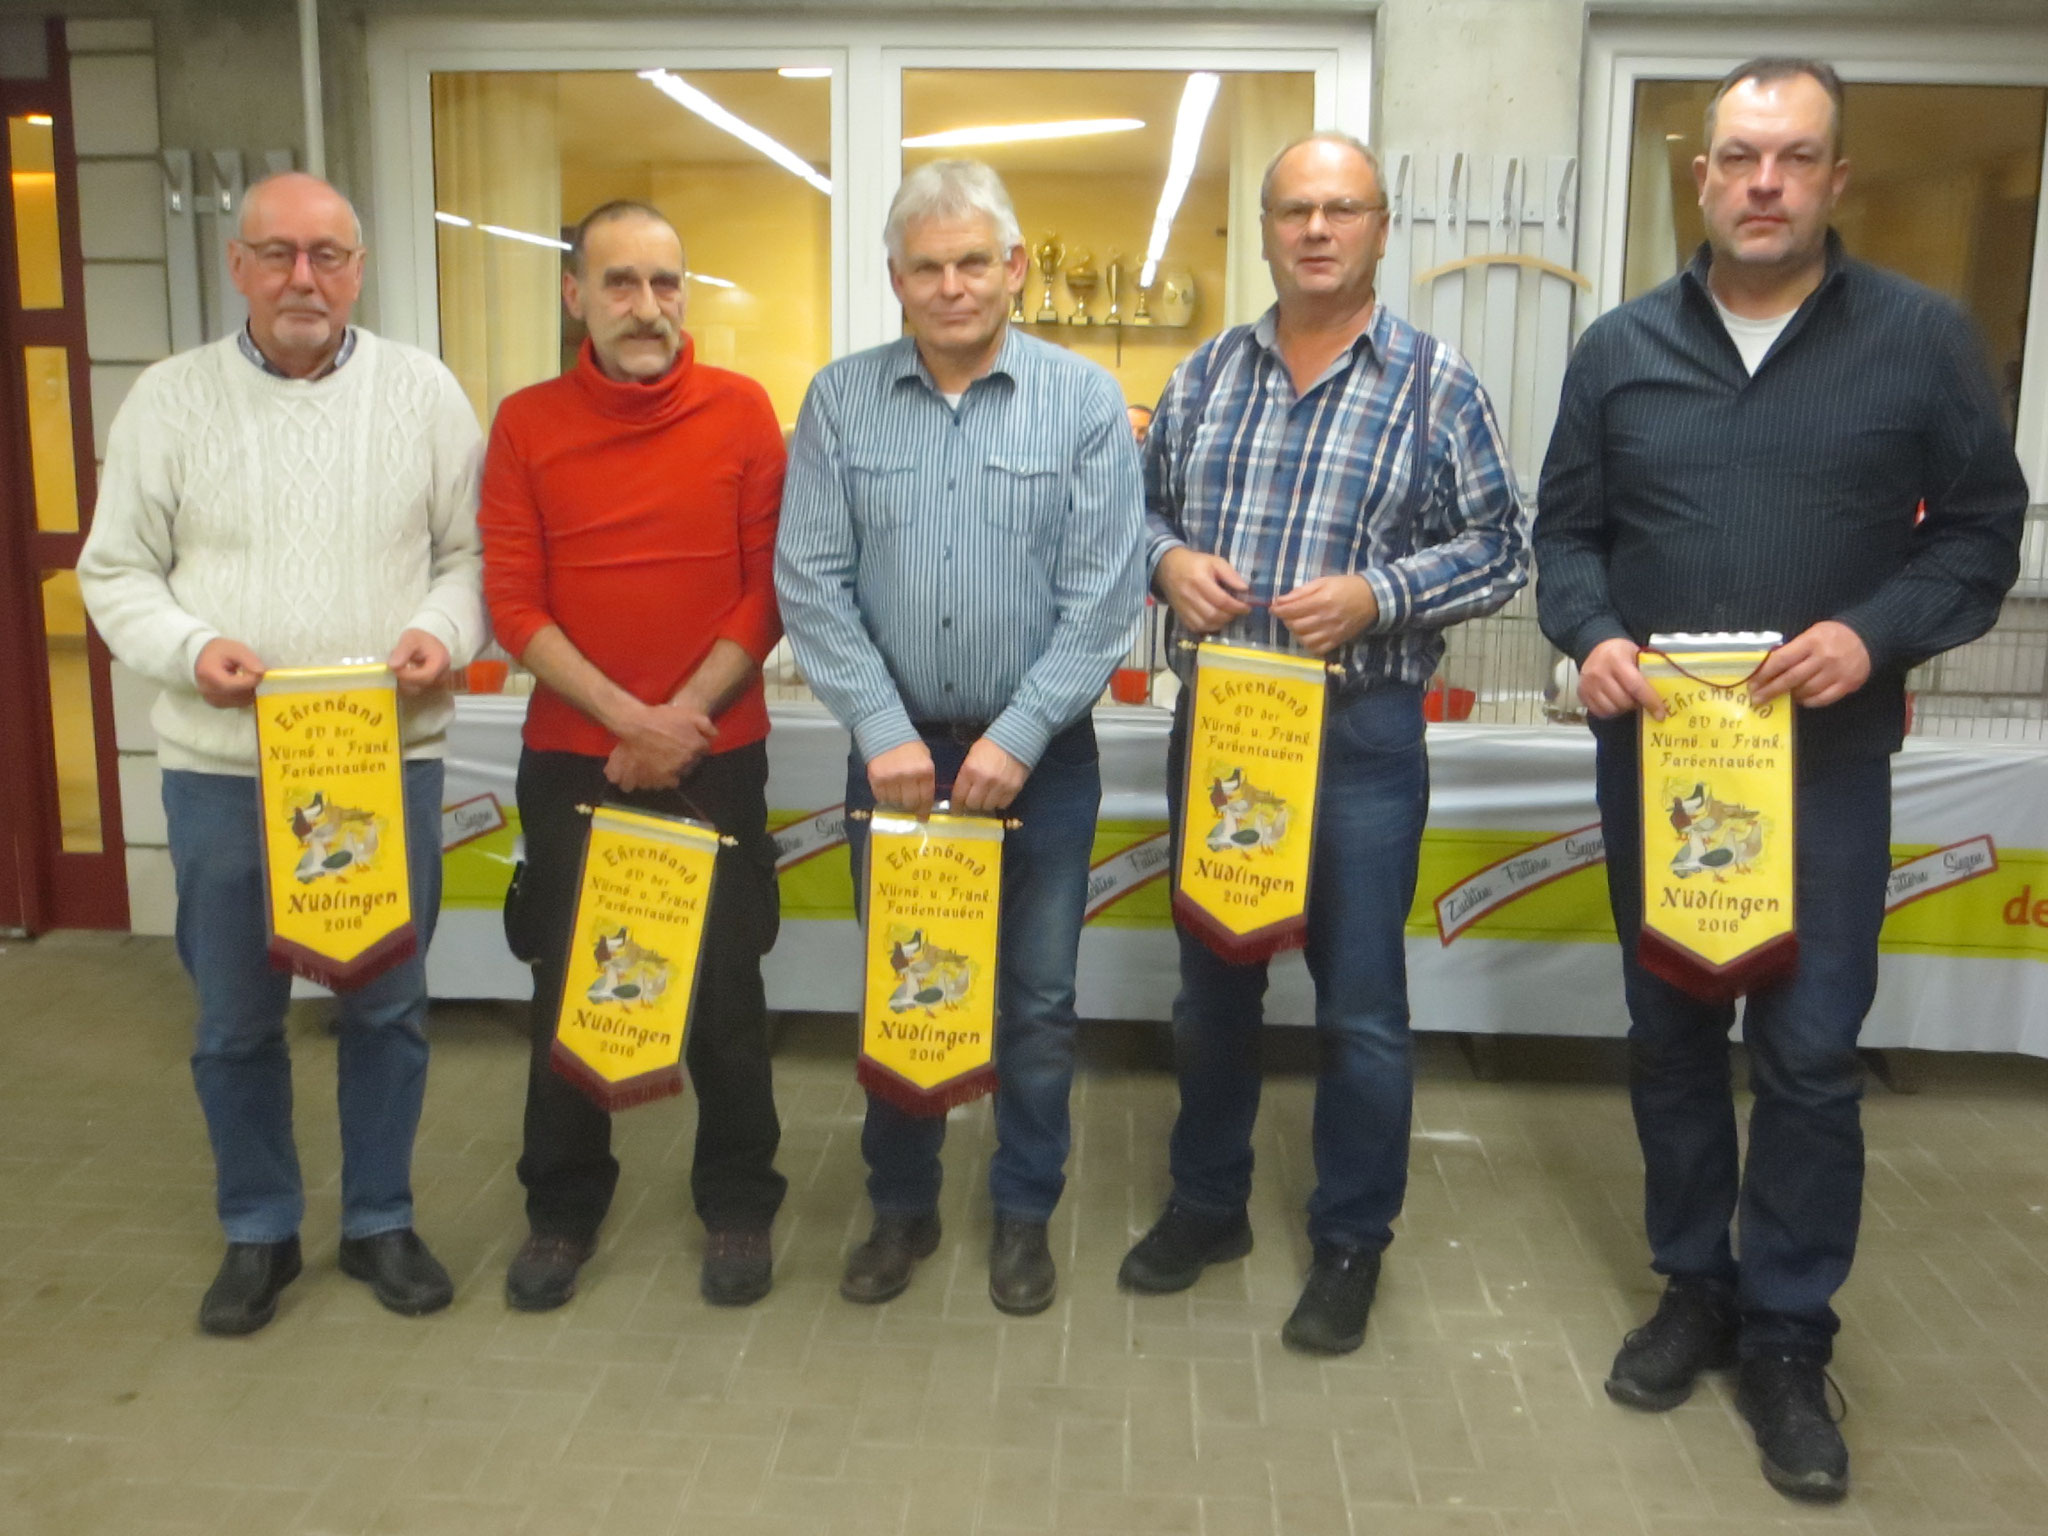 Erringer der SV-Bänder mit Herbert Weber, Friedbert Räder, Wolfgang Wiedmann, Günther Wlotzka und Stefan Rinecker